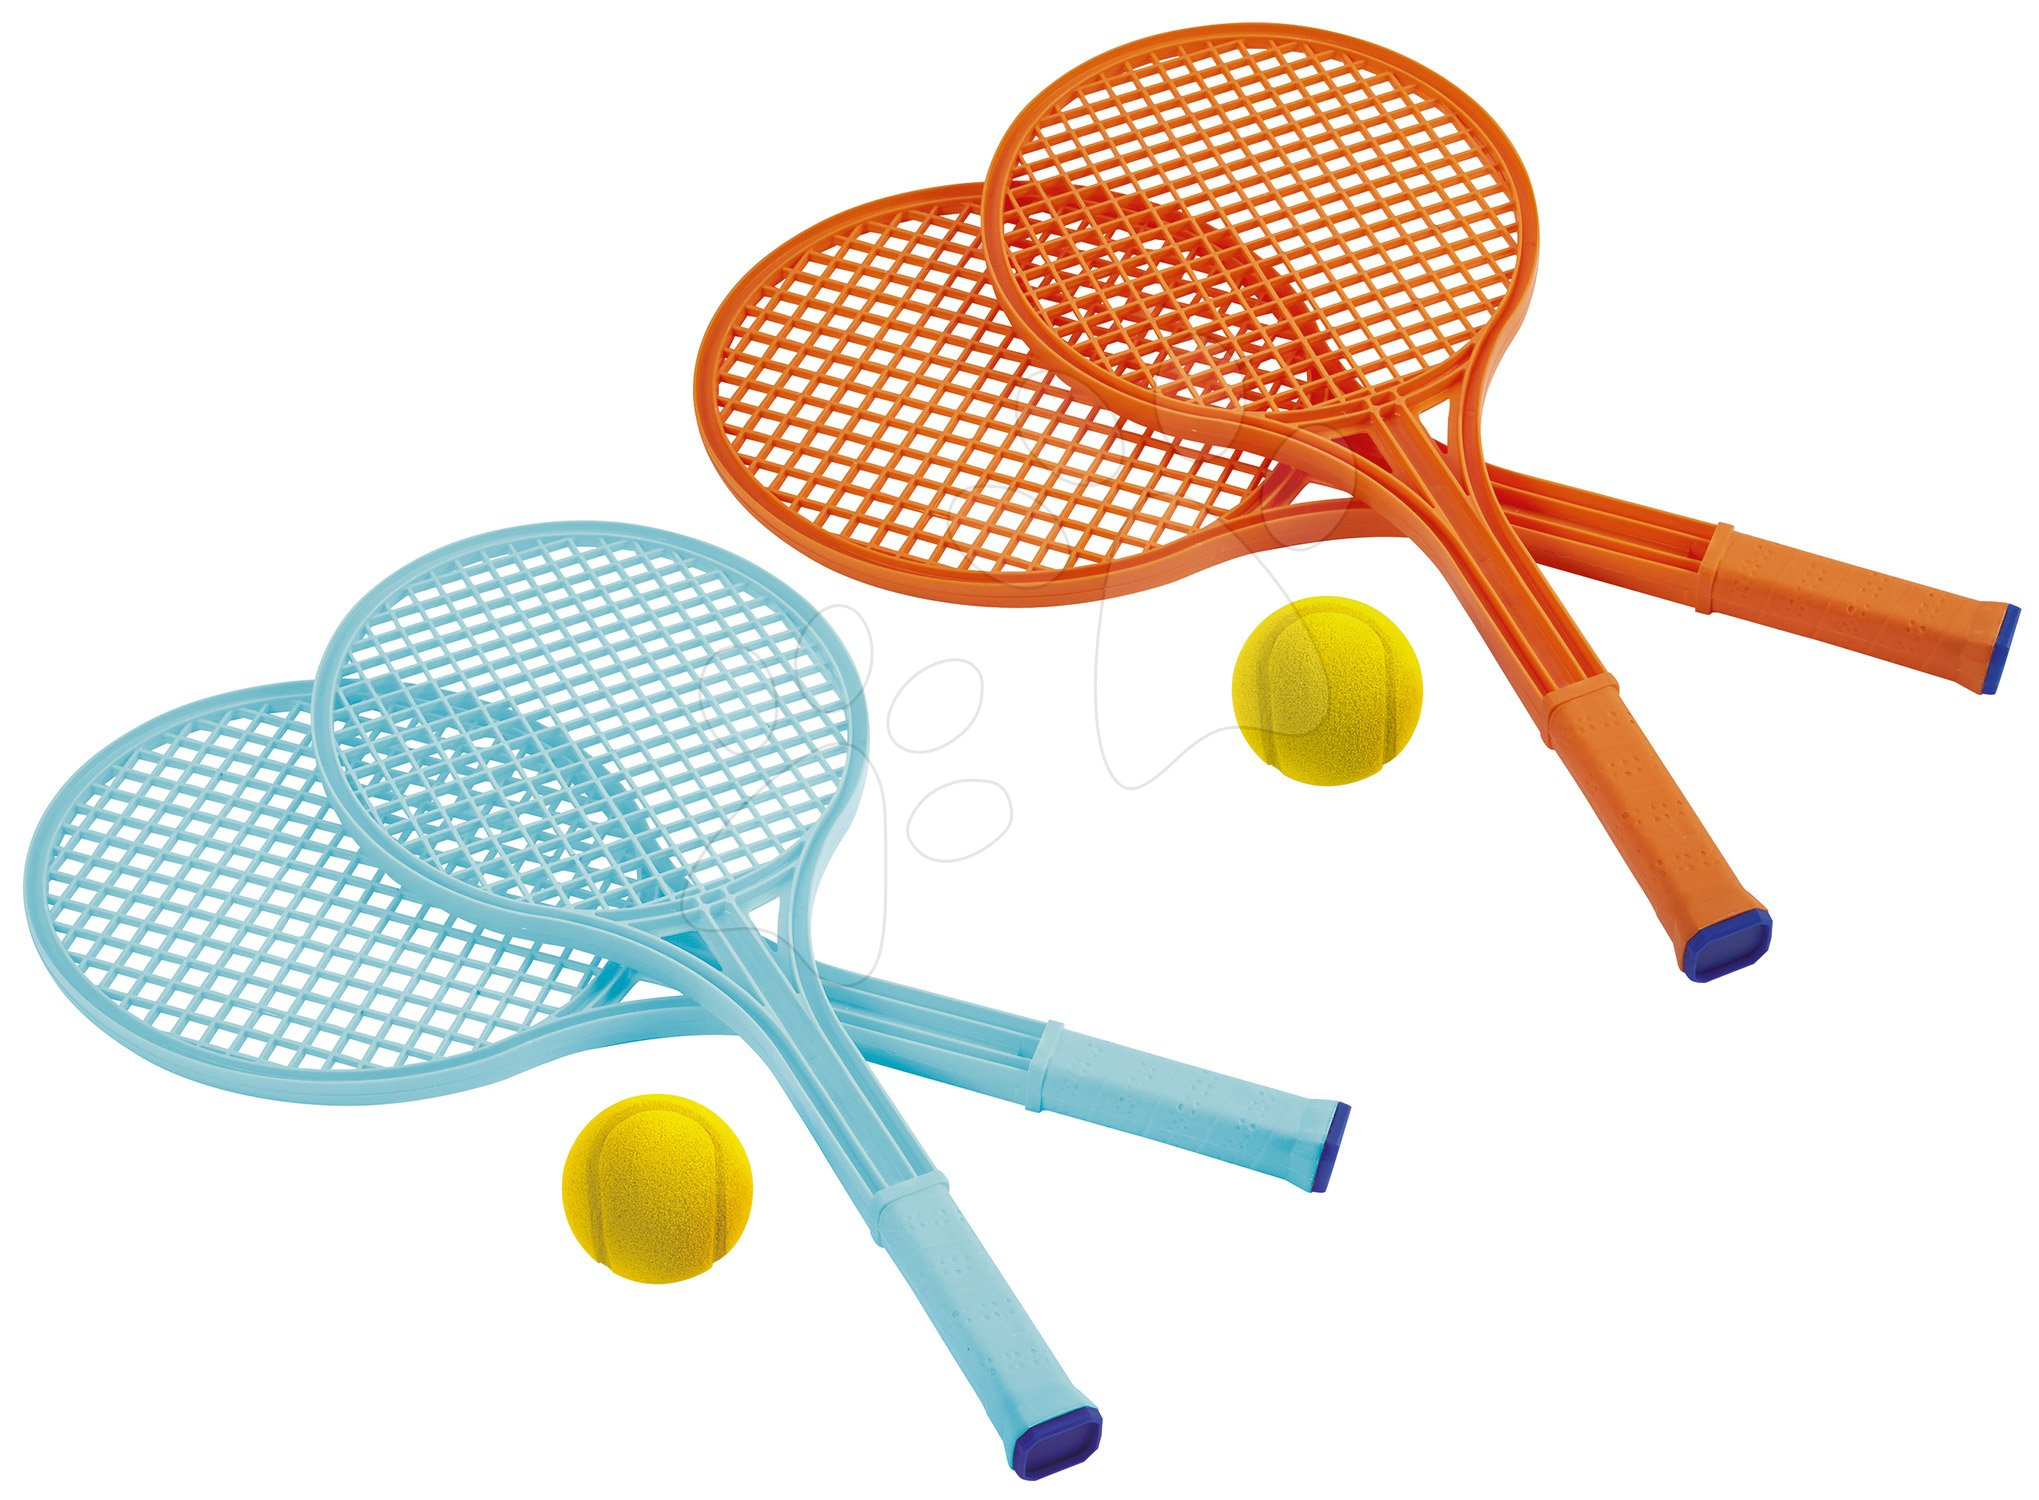 Tenis cu minge de burete spumă Sport Écoiffier 55 cm de la 18 luni